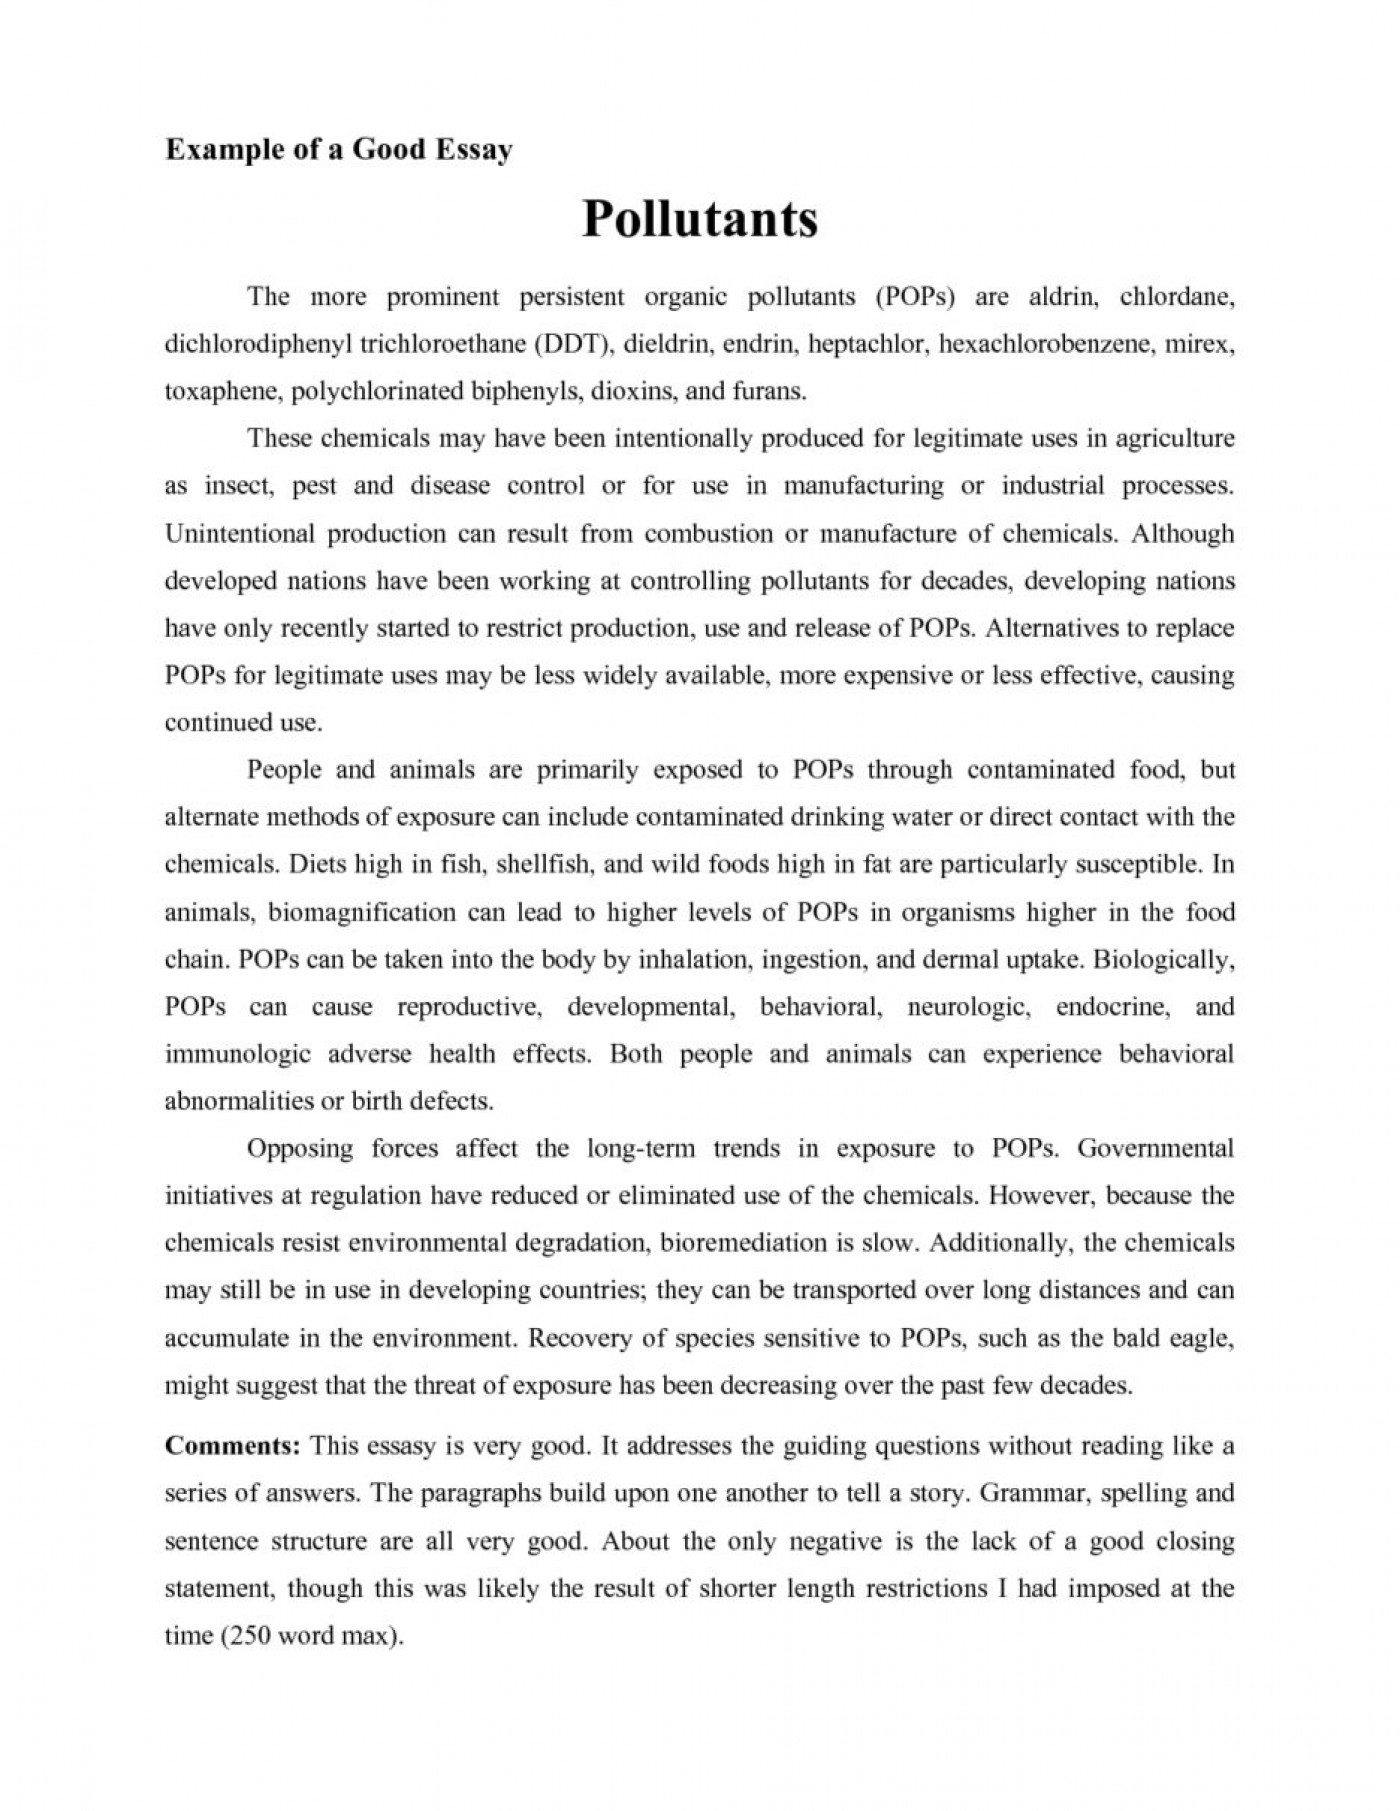 015 examples of common app essays essay example